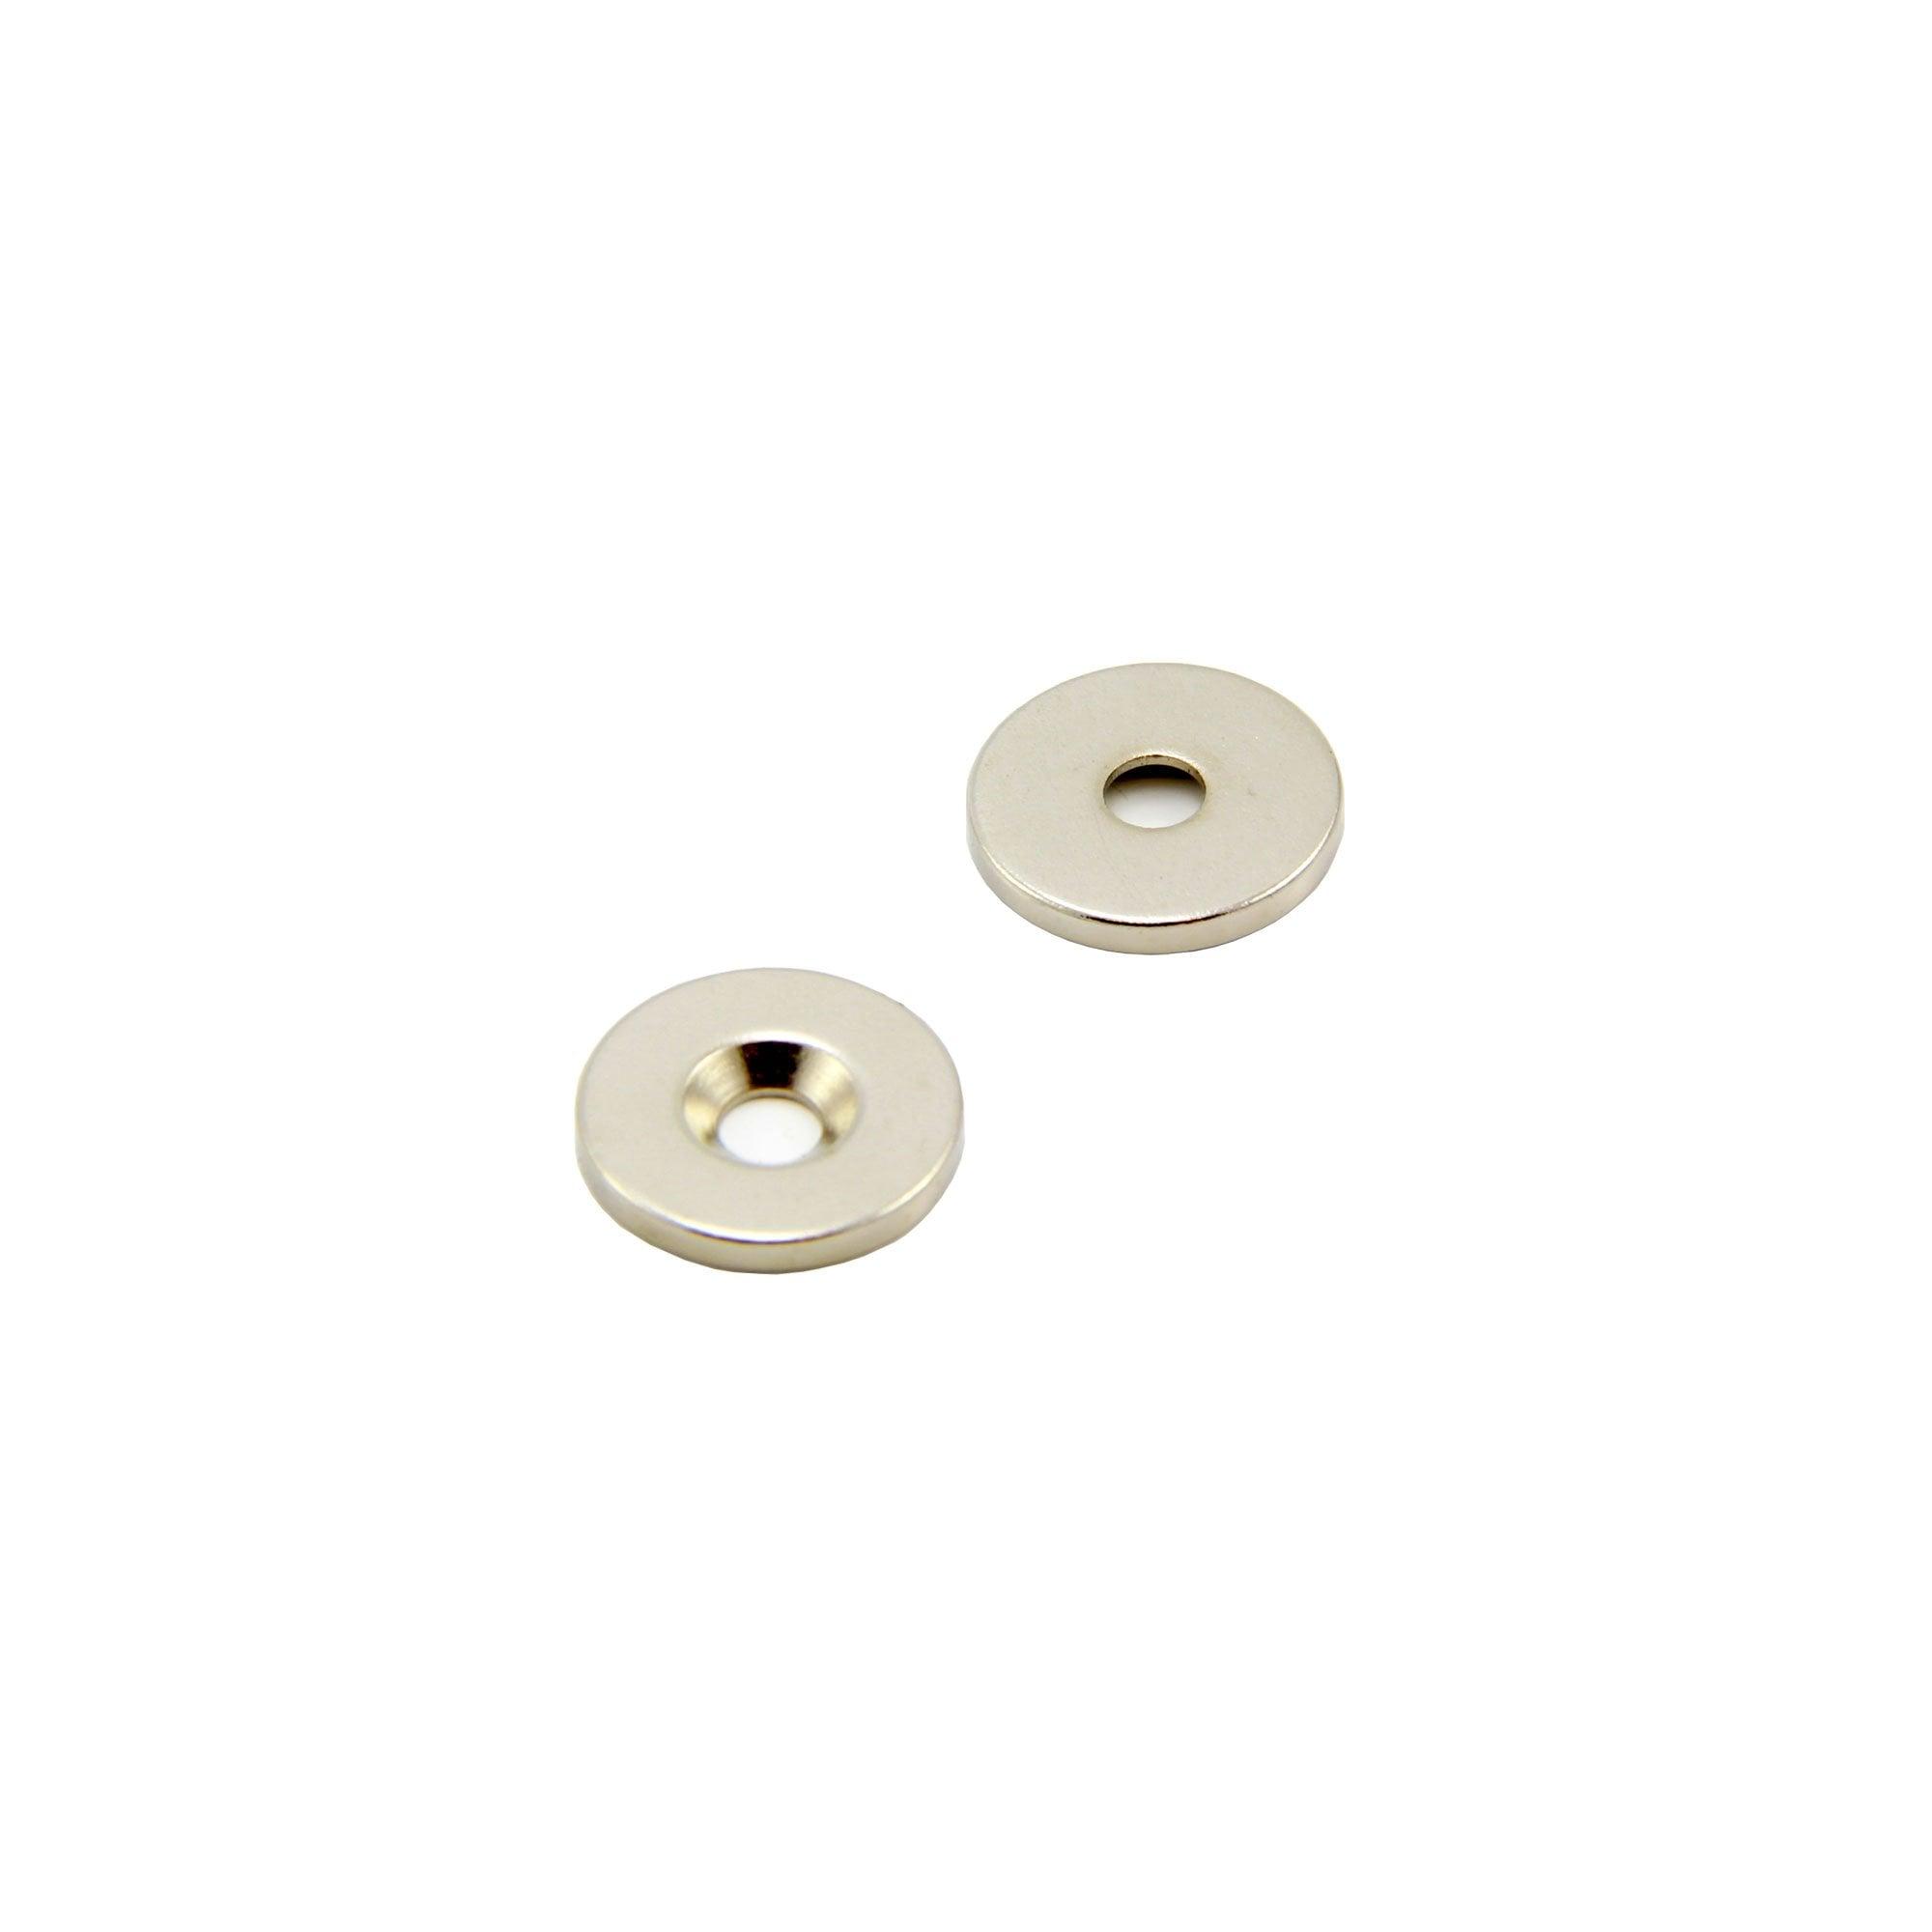 tenuta fino a 7,1 kg first4magnets F205S-2 6 mm al neodimio Magnete con testa svasata 2 pz. /ø 20 x 5 mm